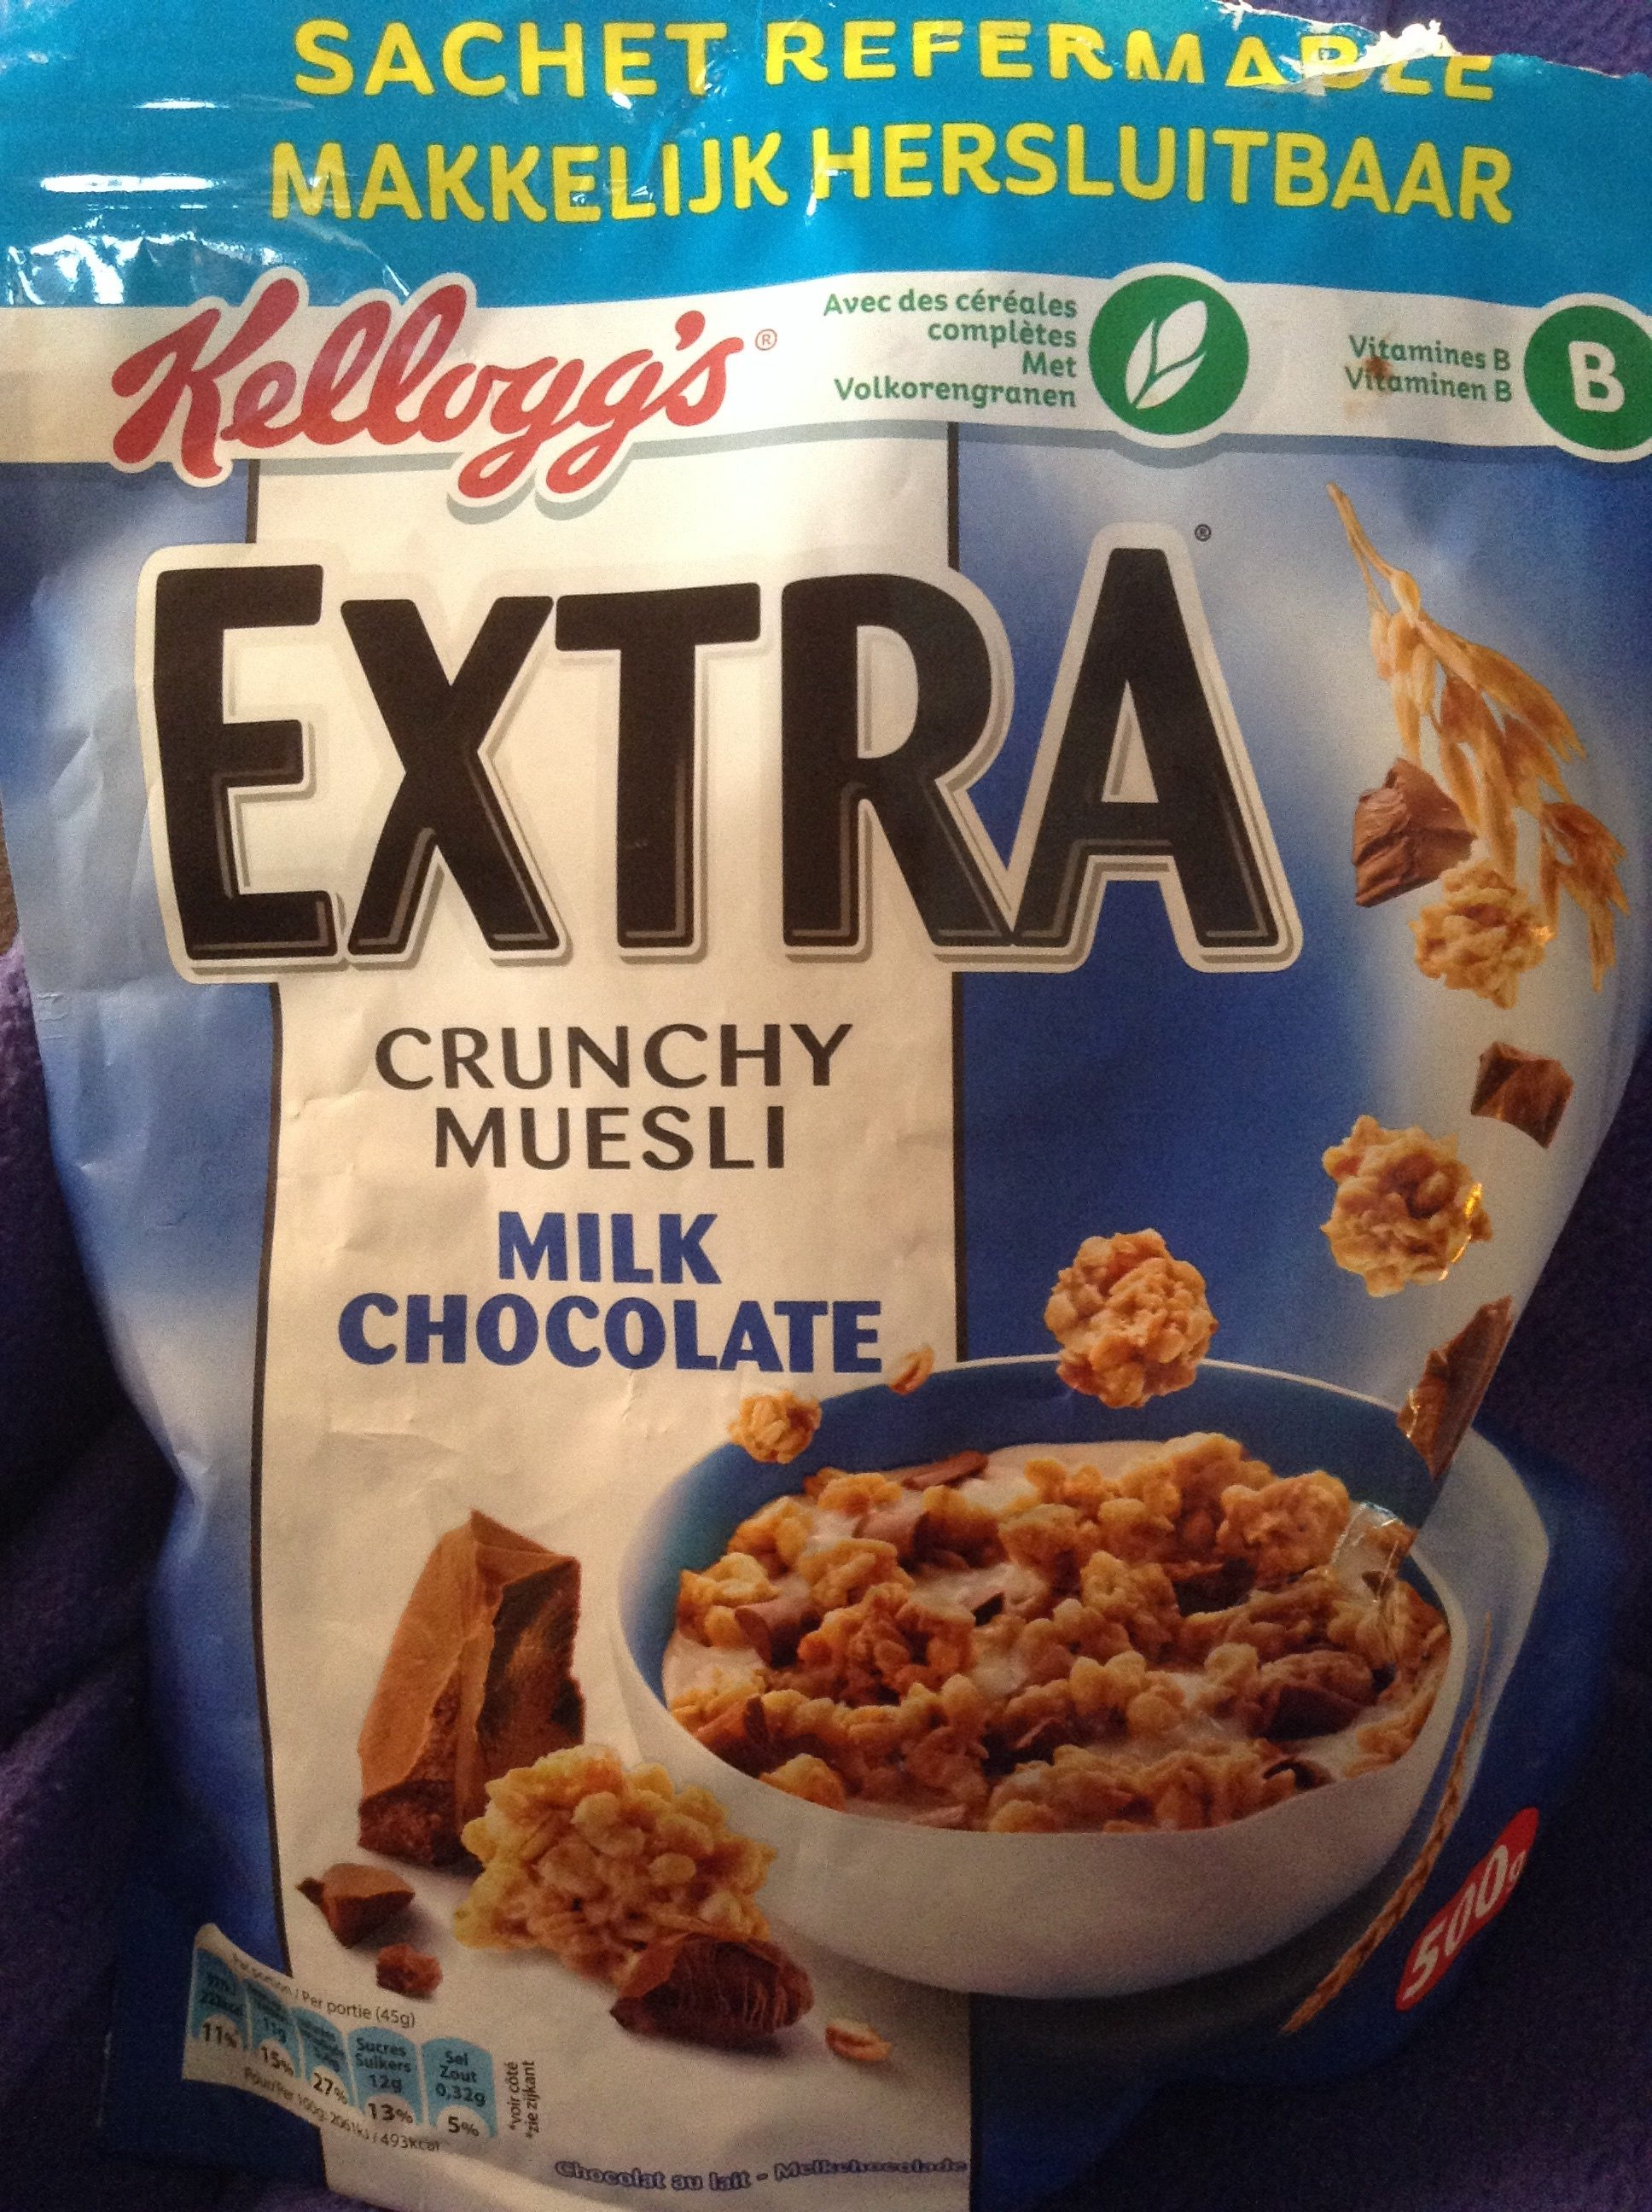 Extra - Crunchy Muesli - Milk Chocolate - Product